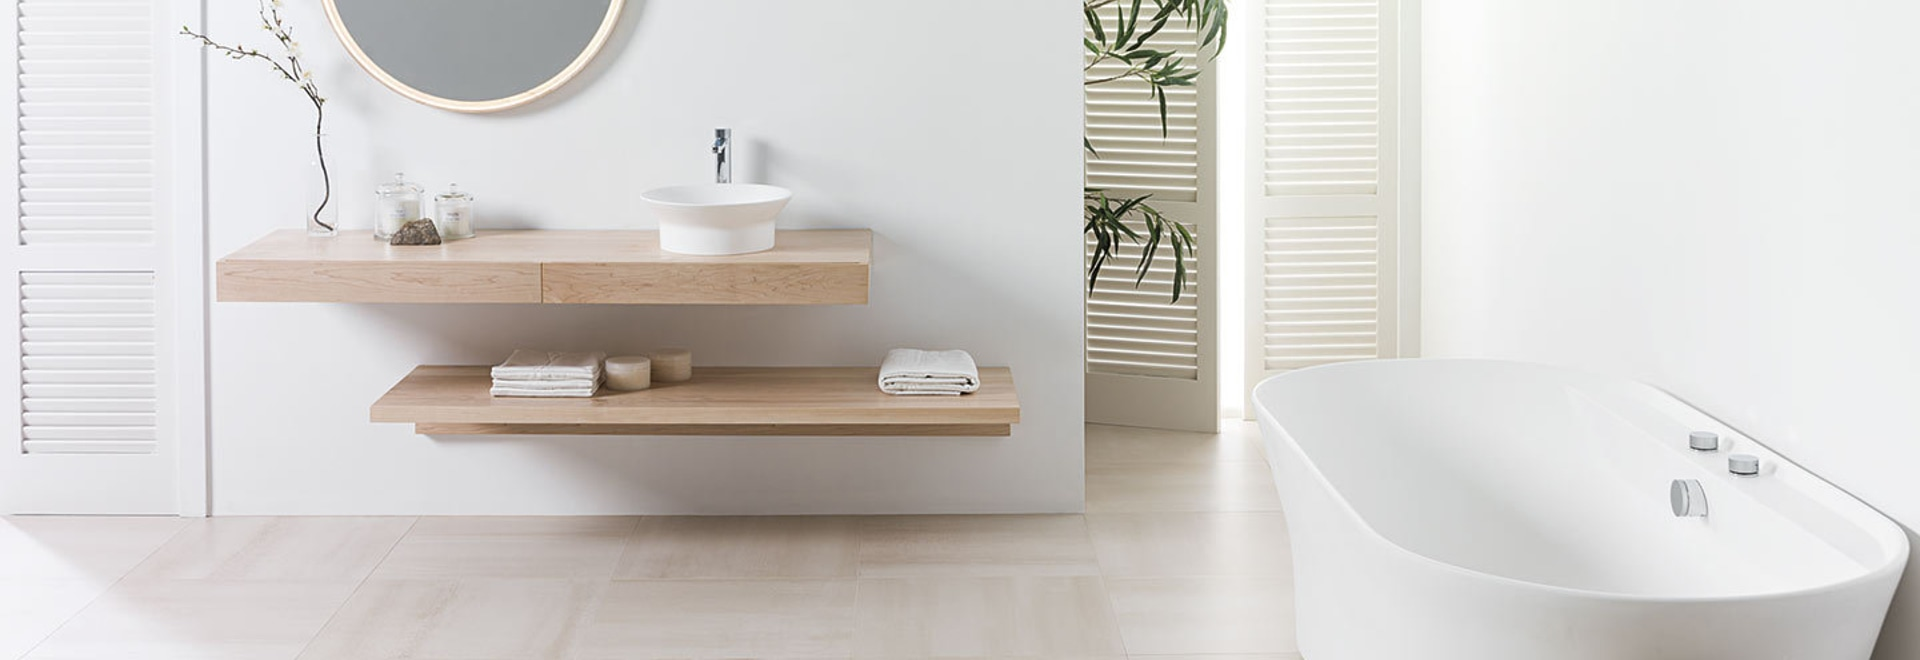 Bringing minimalist harmony to bathrooms